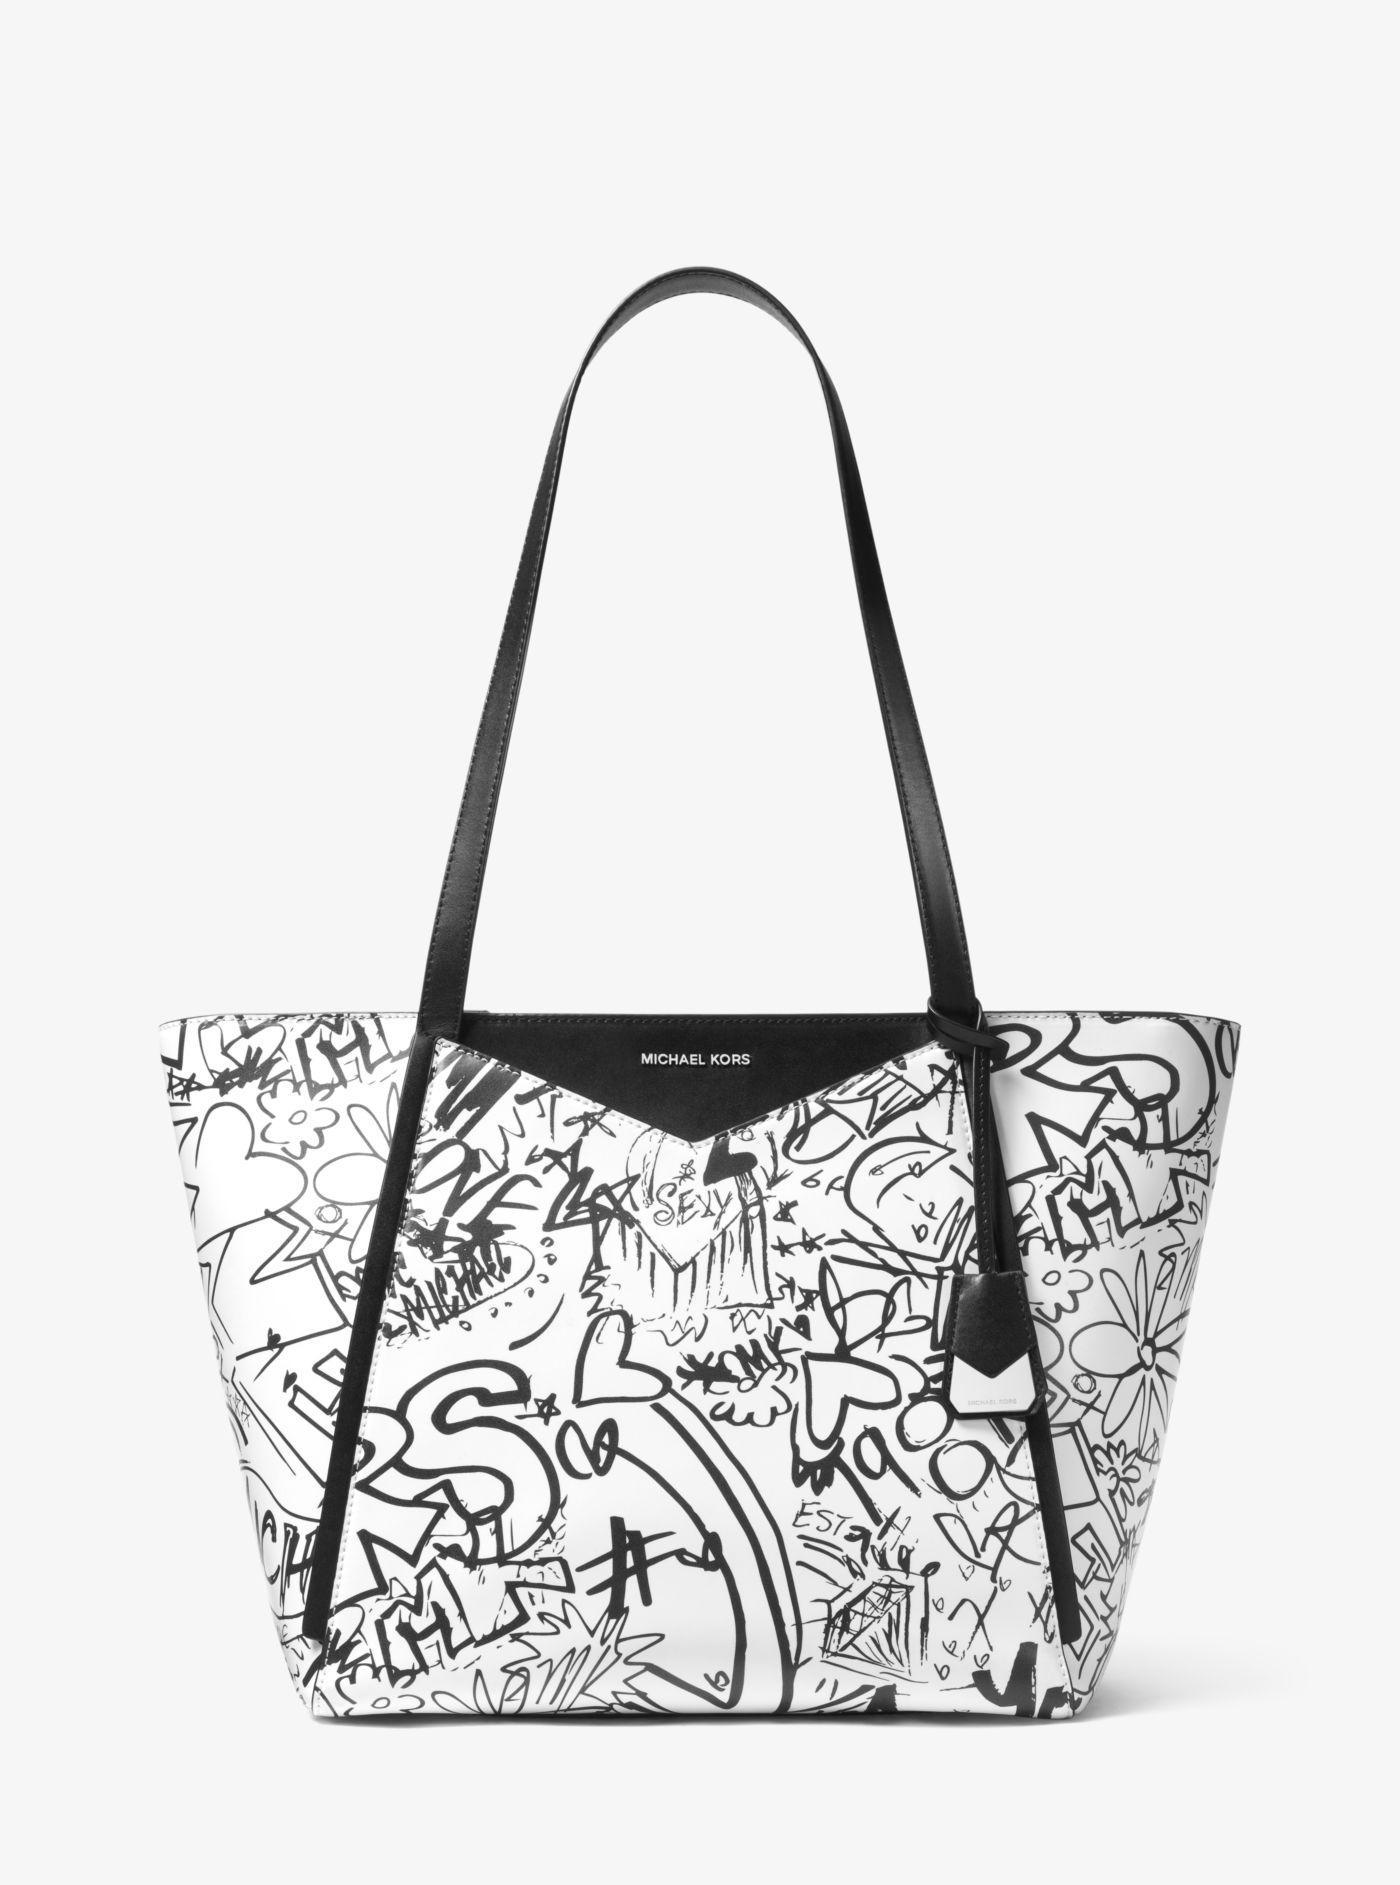 154f9024dde8 Lyst - Michael Kors Whitney Large Graffiti Leather Tote